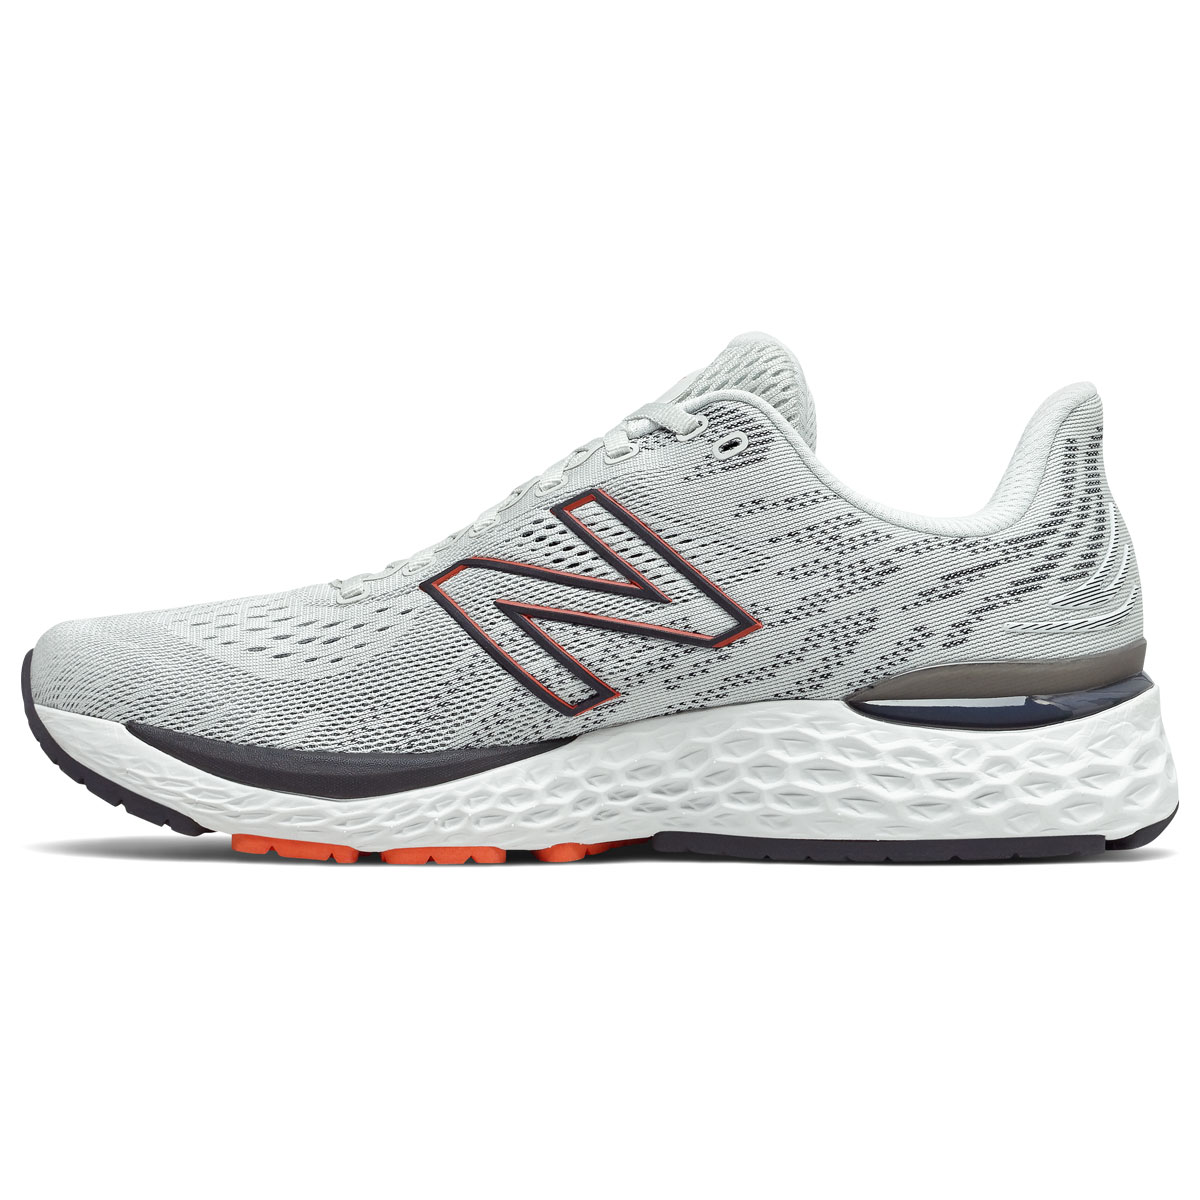 Men's New Balance Fresh Foam 880v11 Running Shoe - Color: Arrowroot/Ghost Pepper - Size: 7 - Width: Wide, Arrowroot/Ghost Pepper, large, image 2